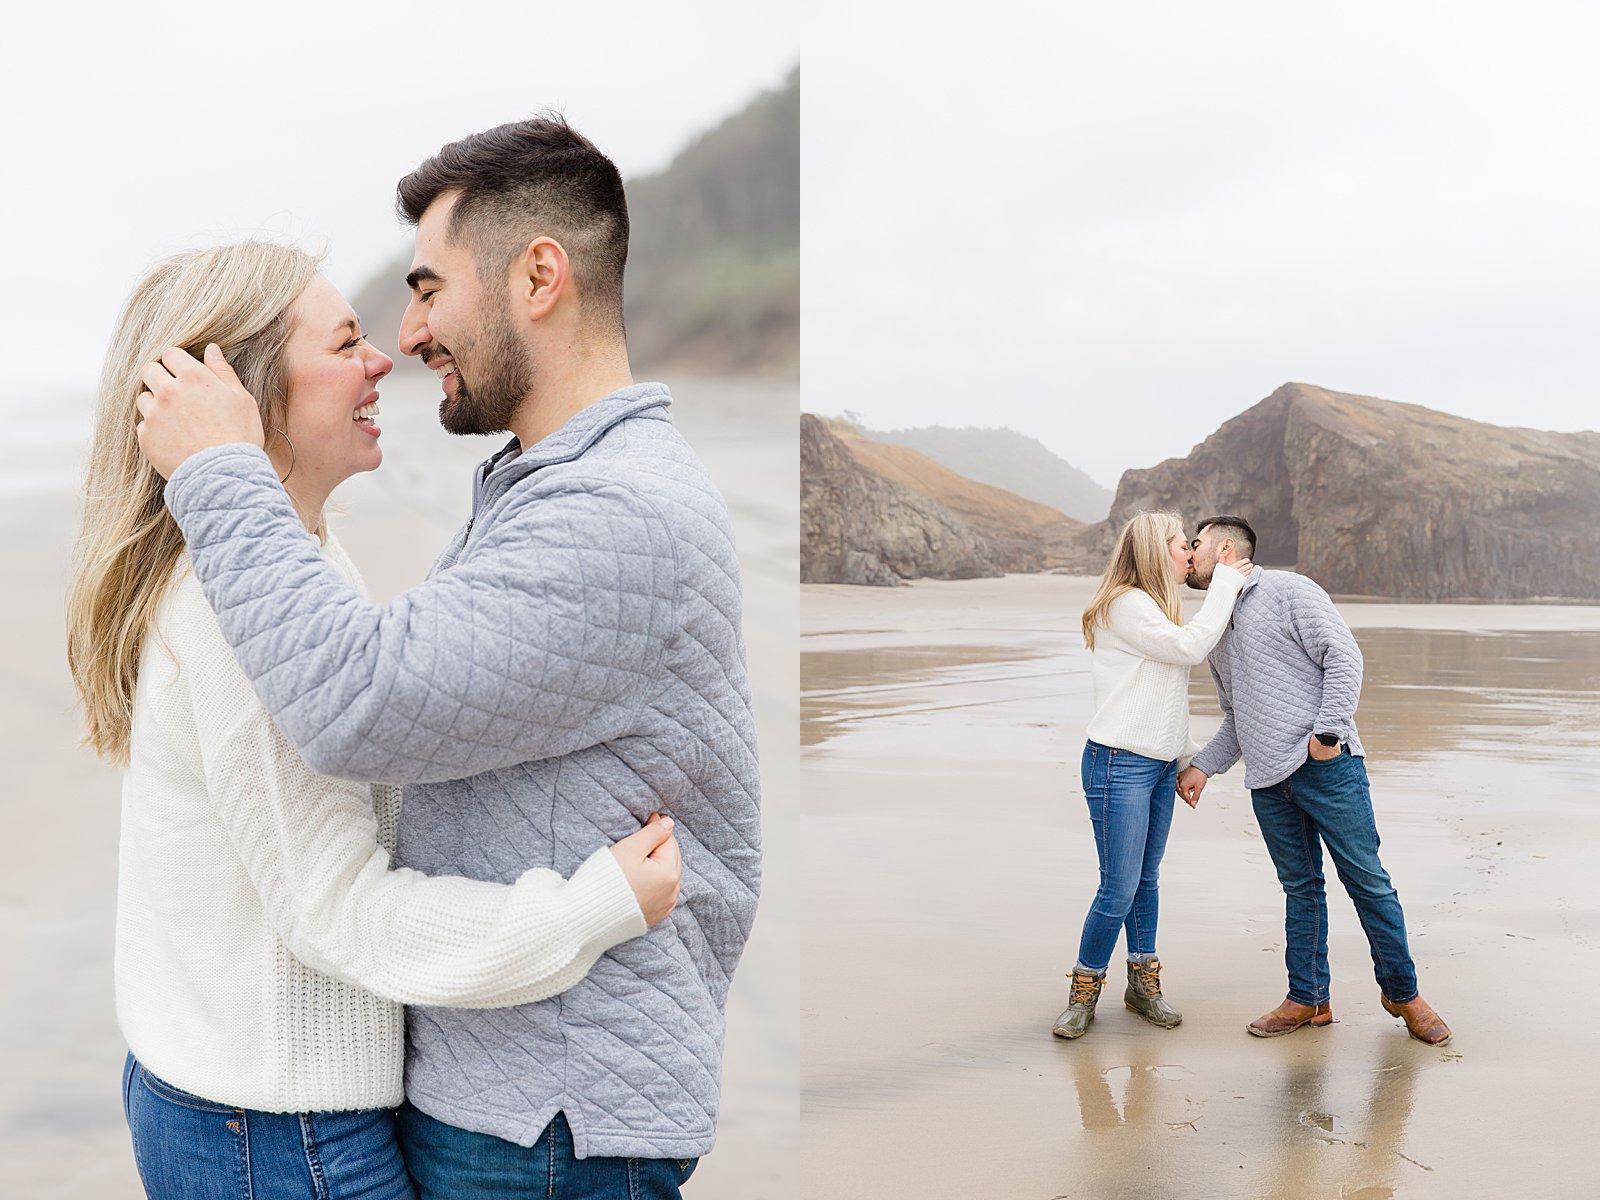 Rebekah Leona Photography | Cape Kiwanda | Beach Photo Session Poses | Oregon Coast Engagement Session